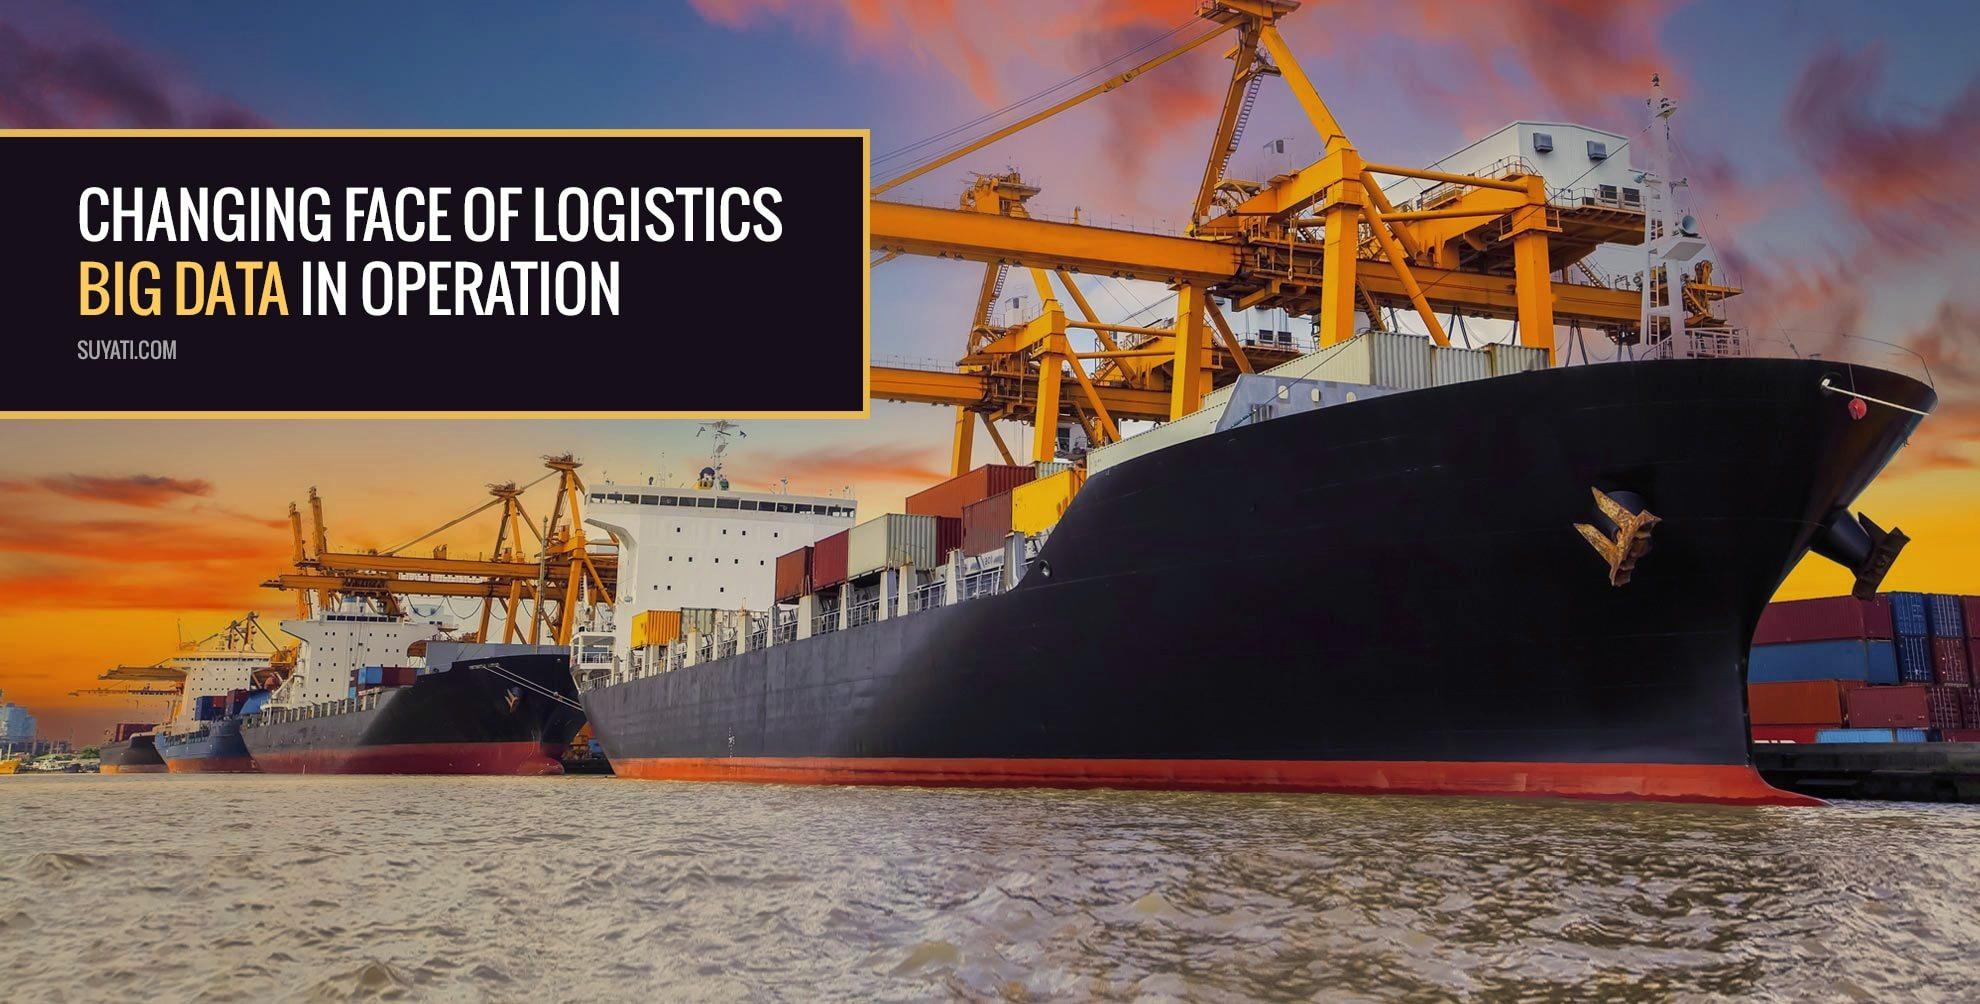 Advanced Logistics with Big Data